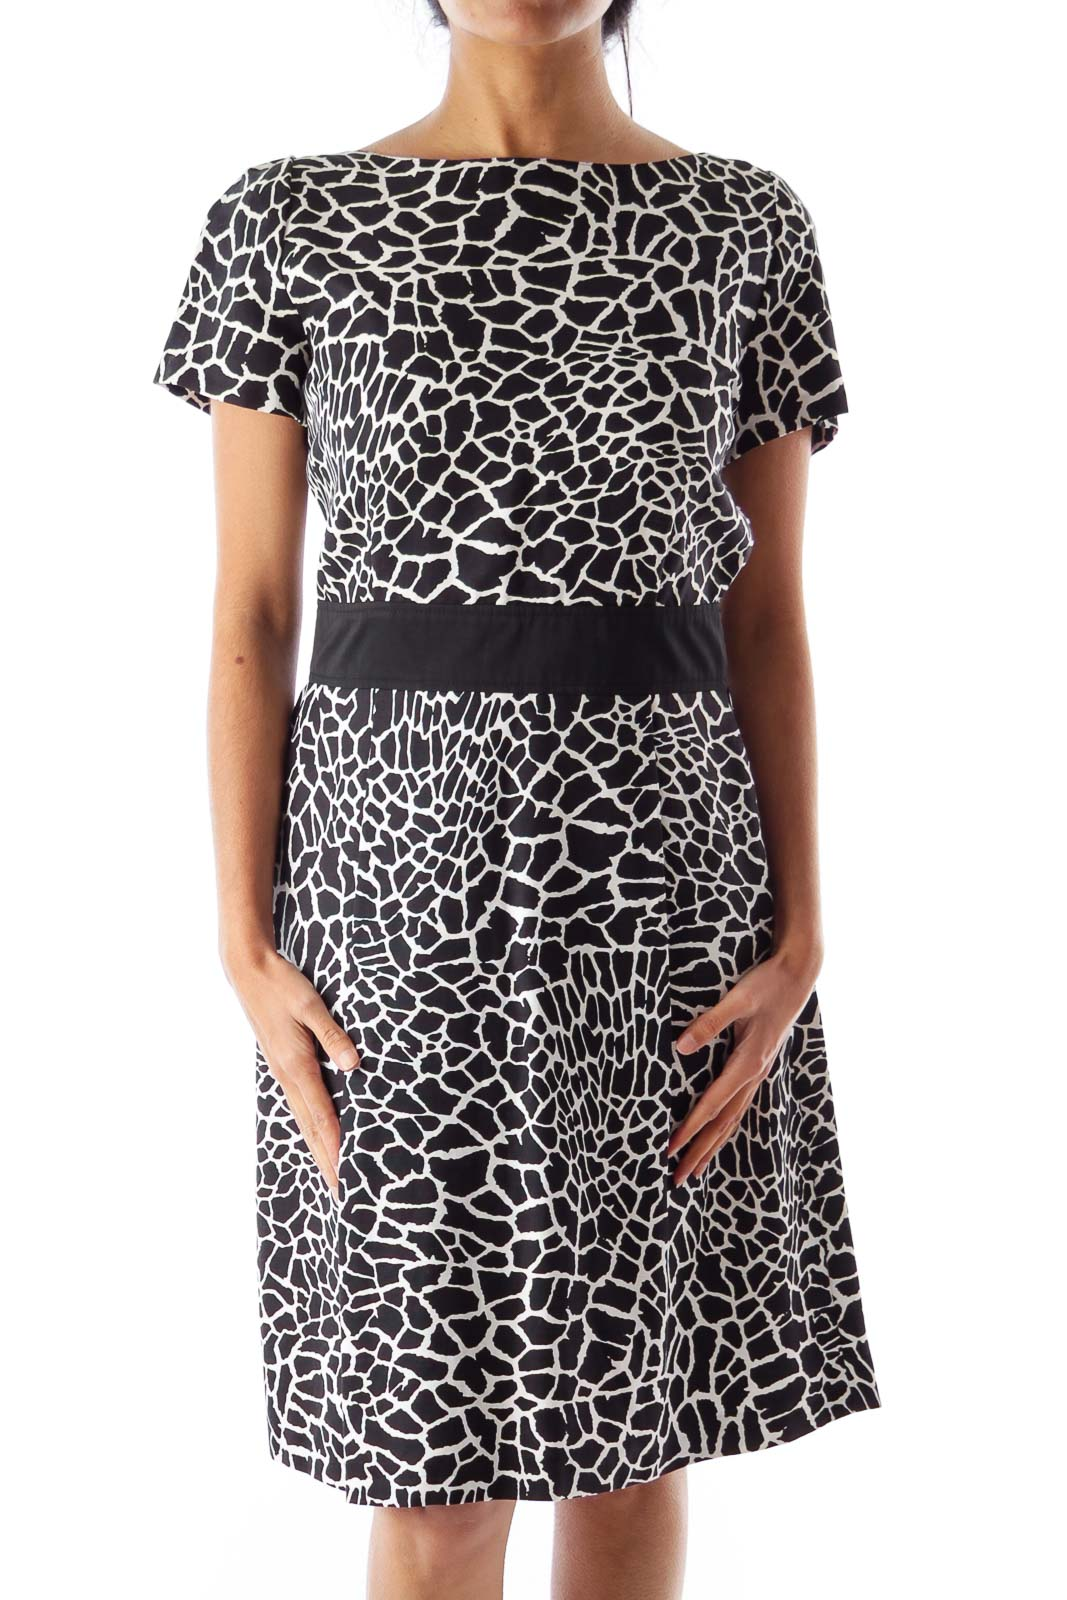 Black & White Print Dress Front